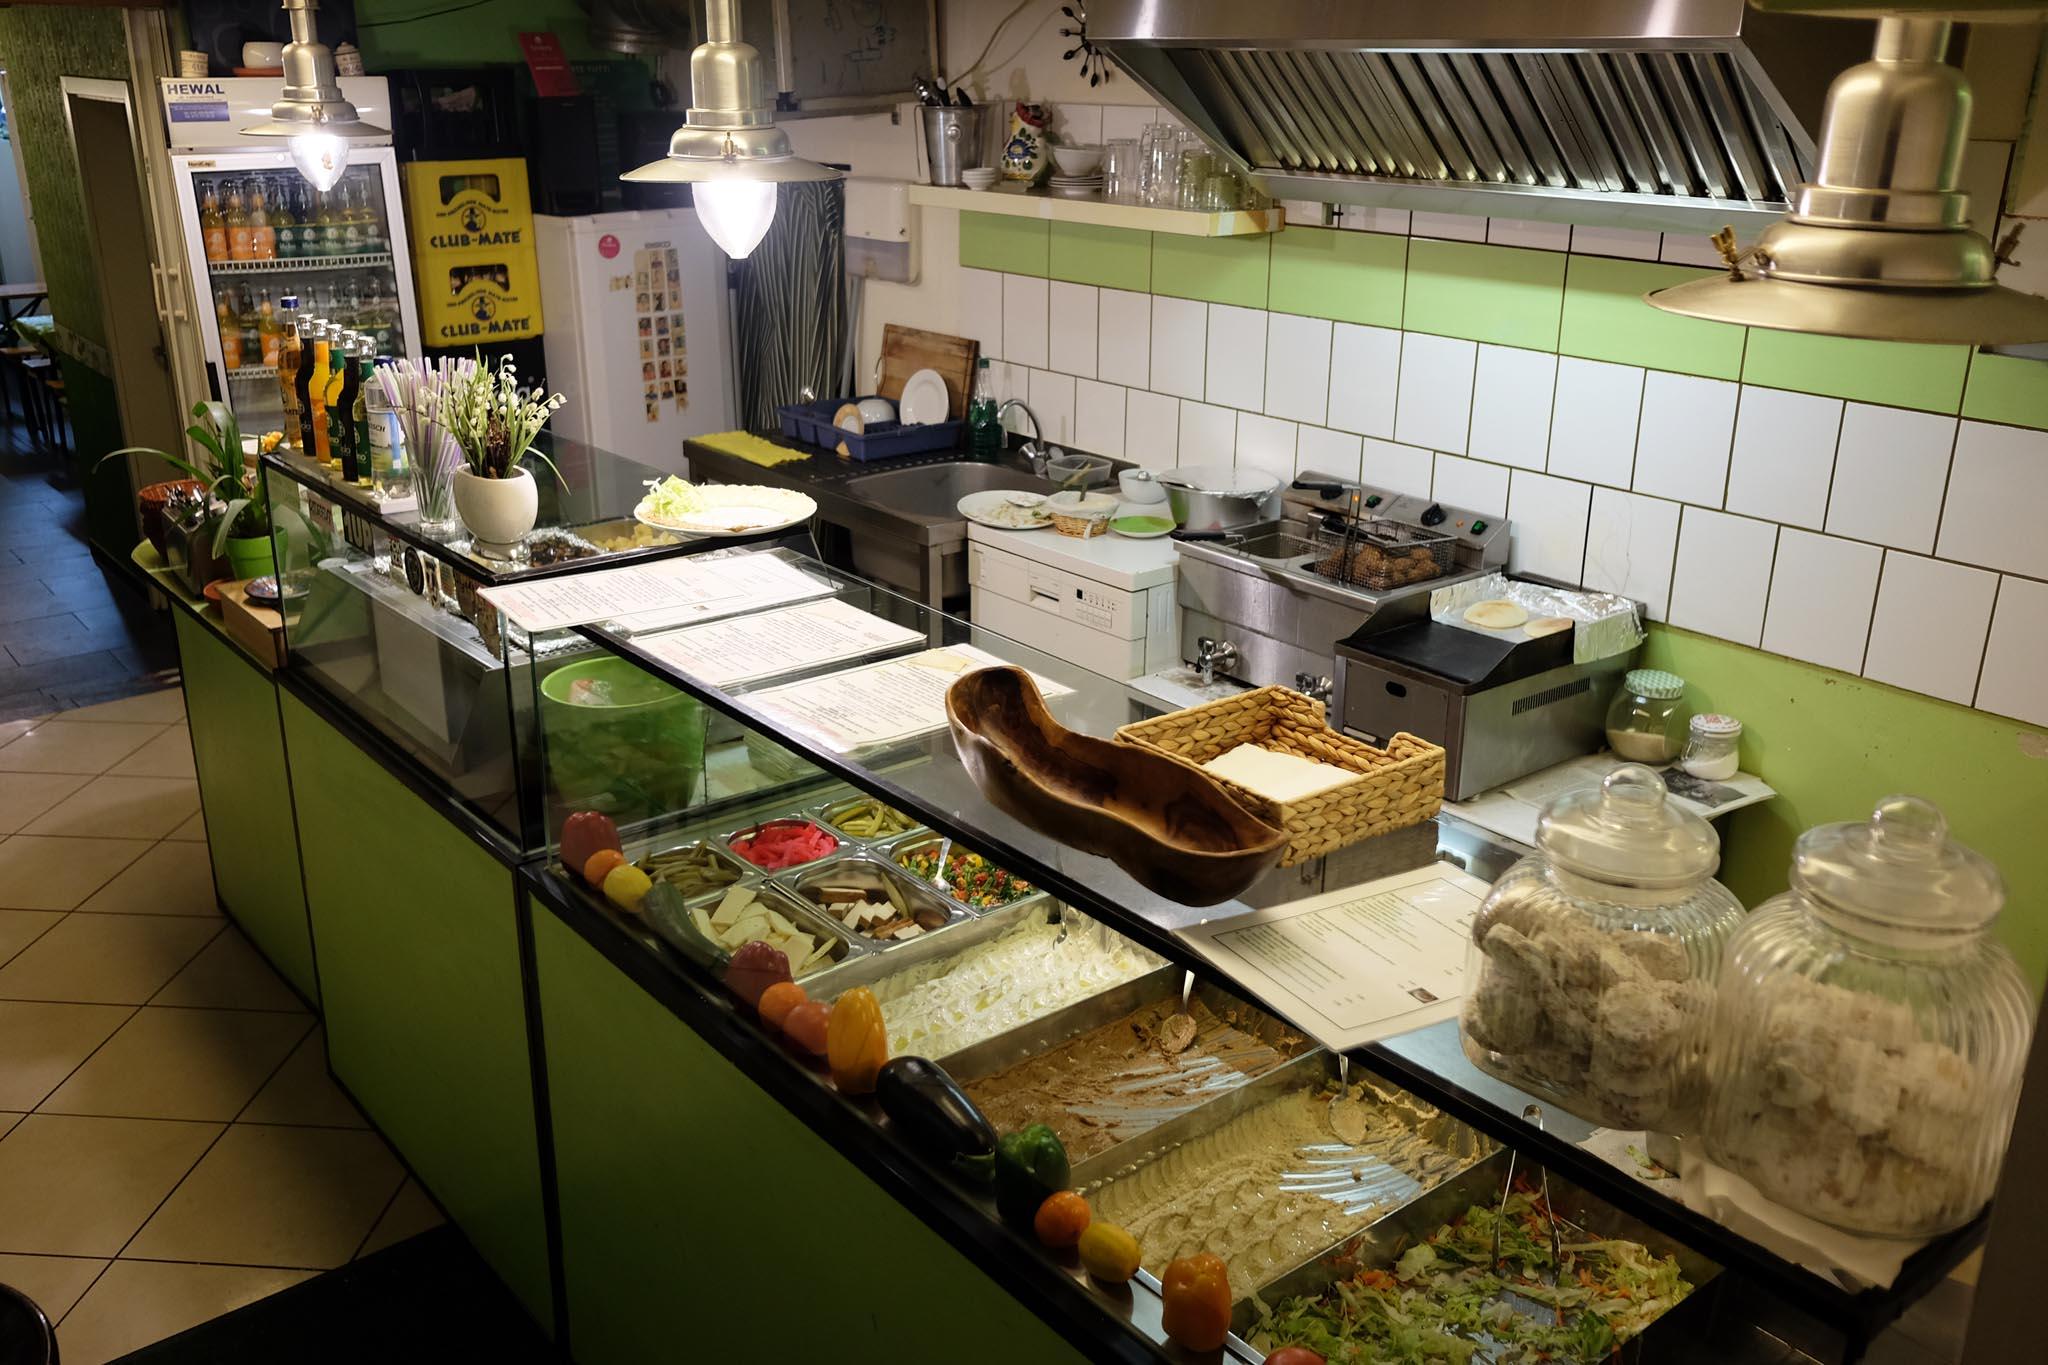 Nett Billige Küchenschränke Spokane Ideen - Küche Set Ideen ...